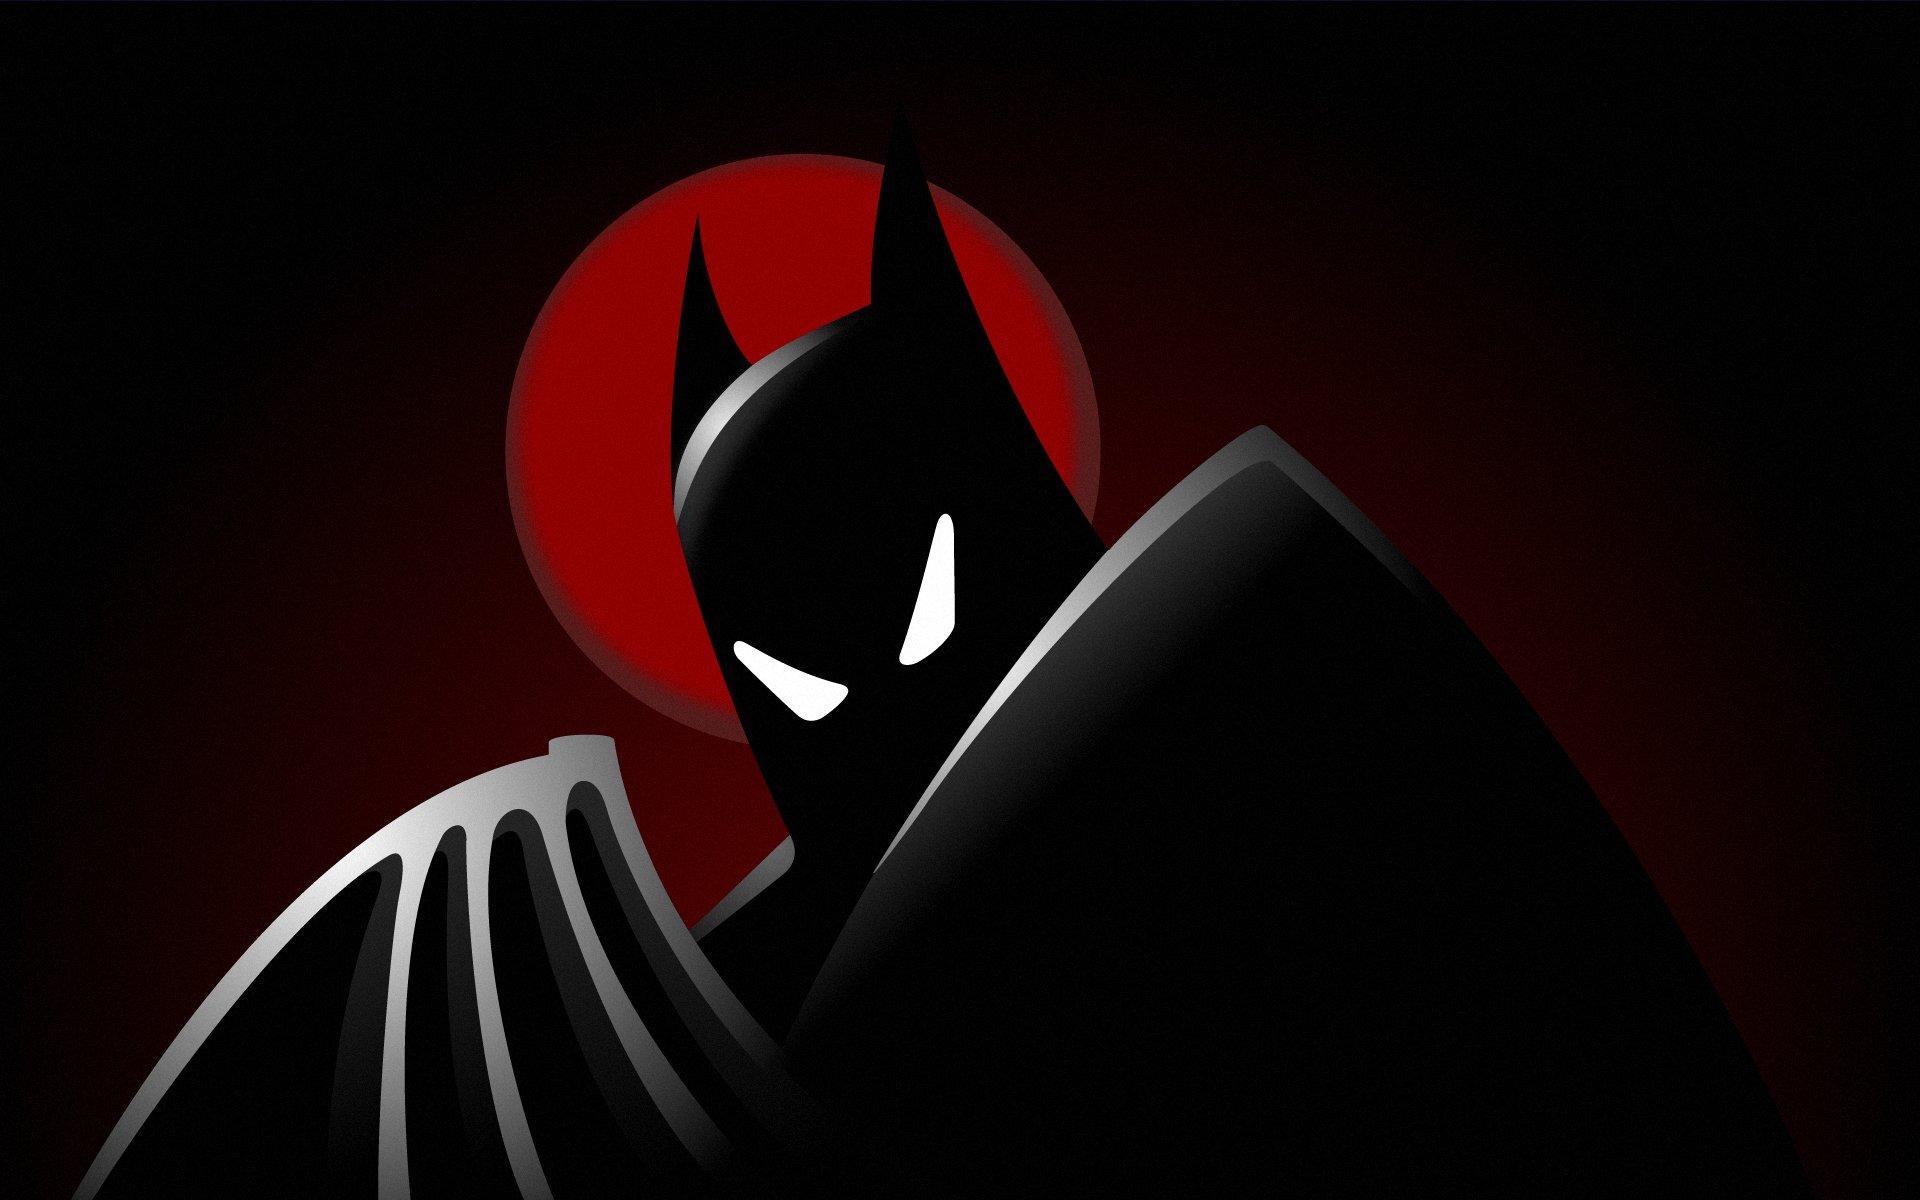 Batman The Animated Series Fondo De Pantalla Hd Fondo De